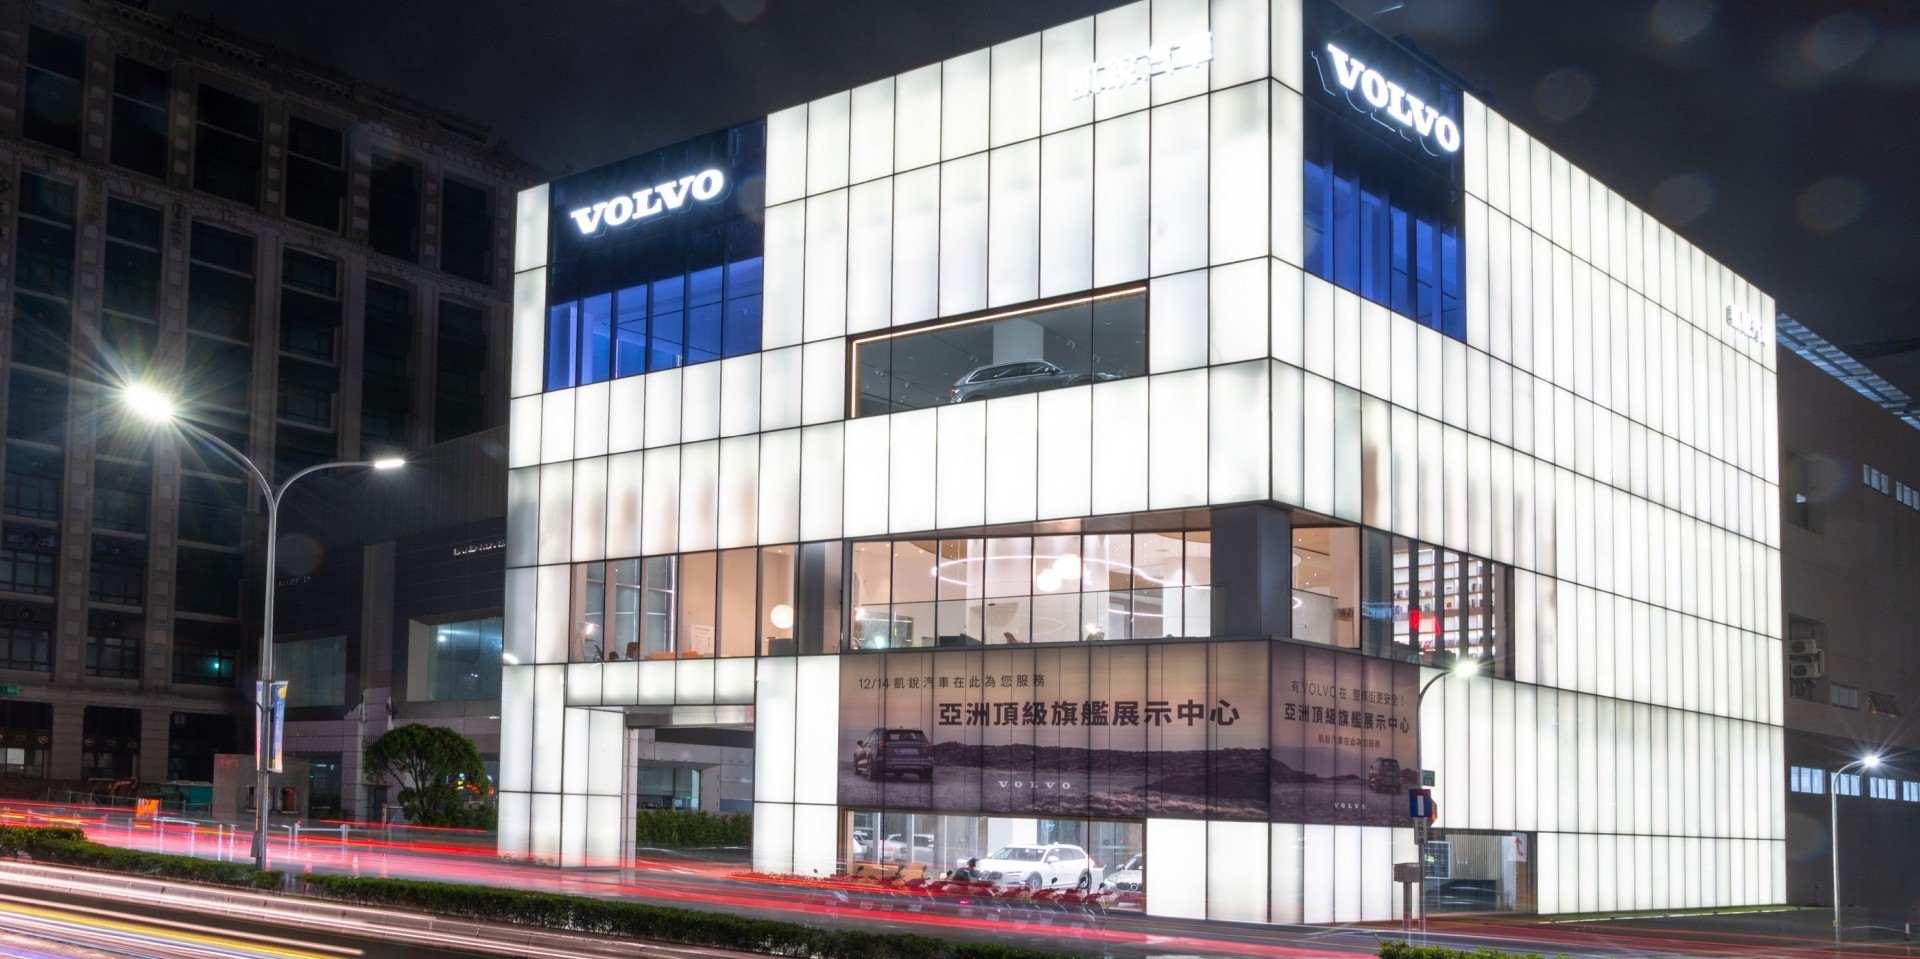 Volvo Retail Experience:斥資五億打造頂級北歐奢華空間,凱銳新莊旗艦店正式開幕